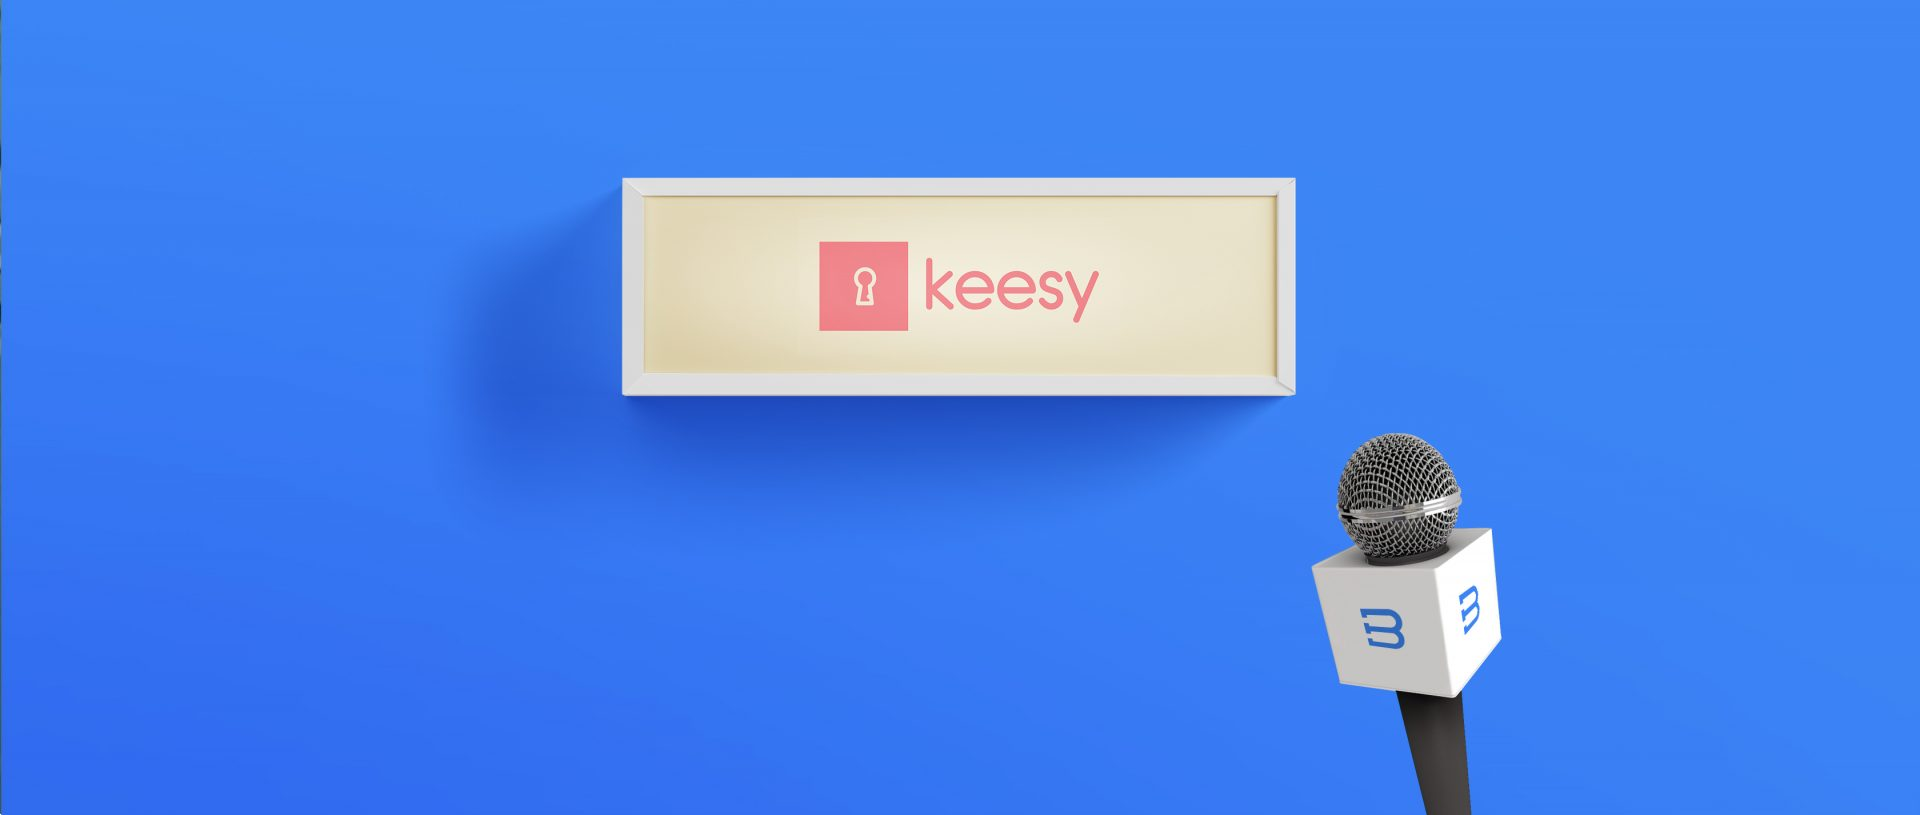 keesy startup